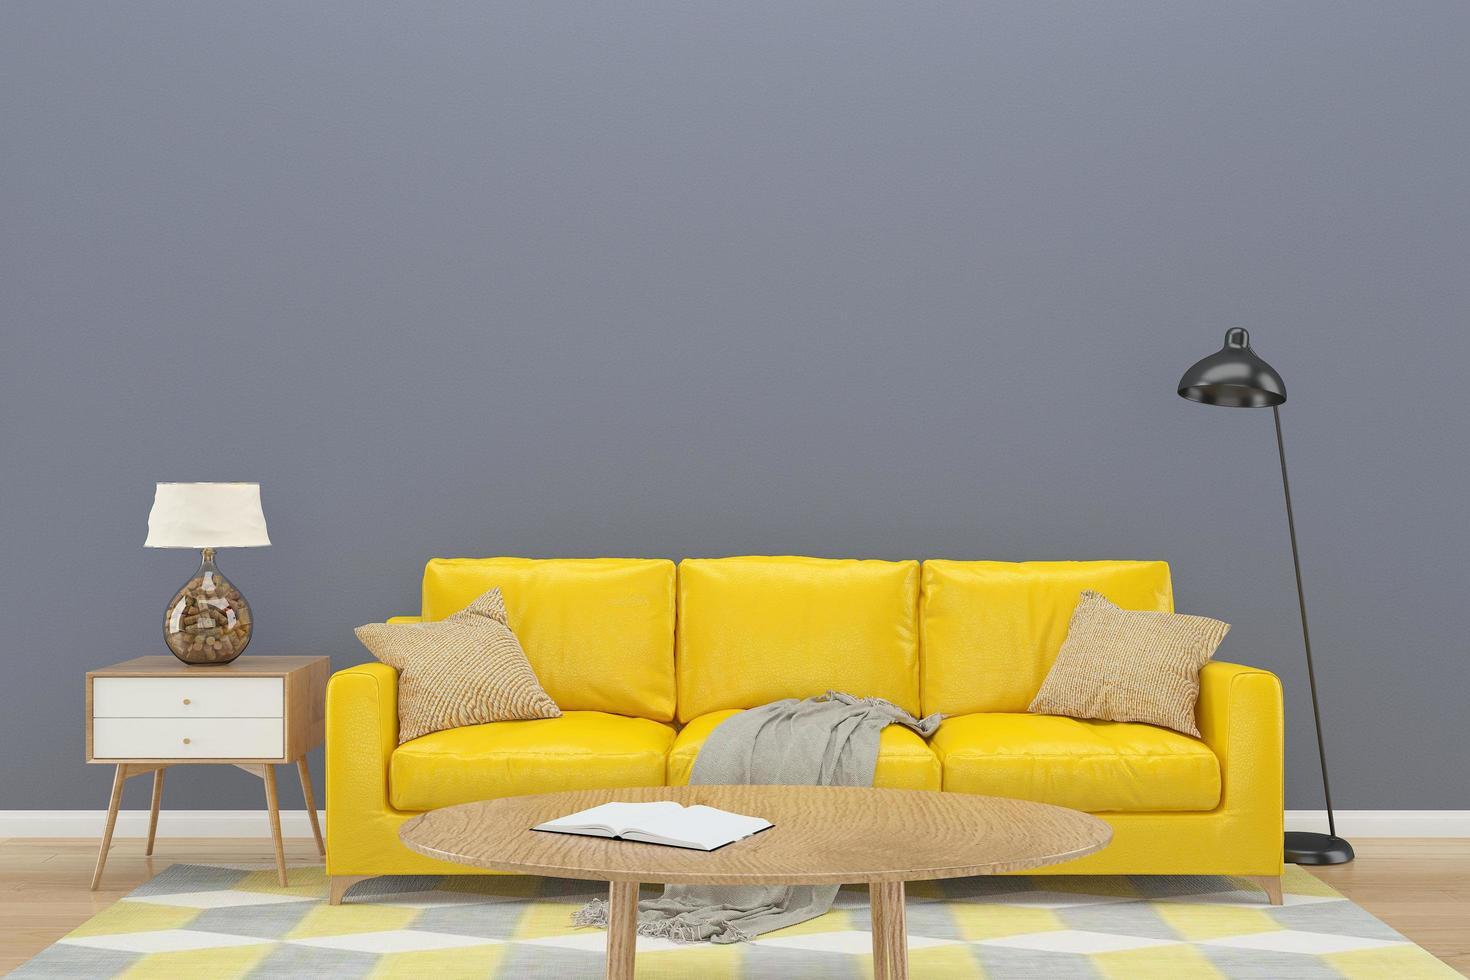 Gray wall with yellow sofa on wood floor  photo